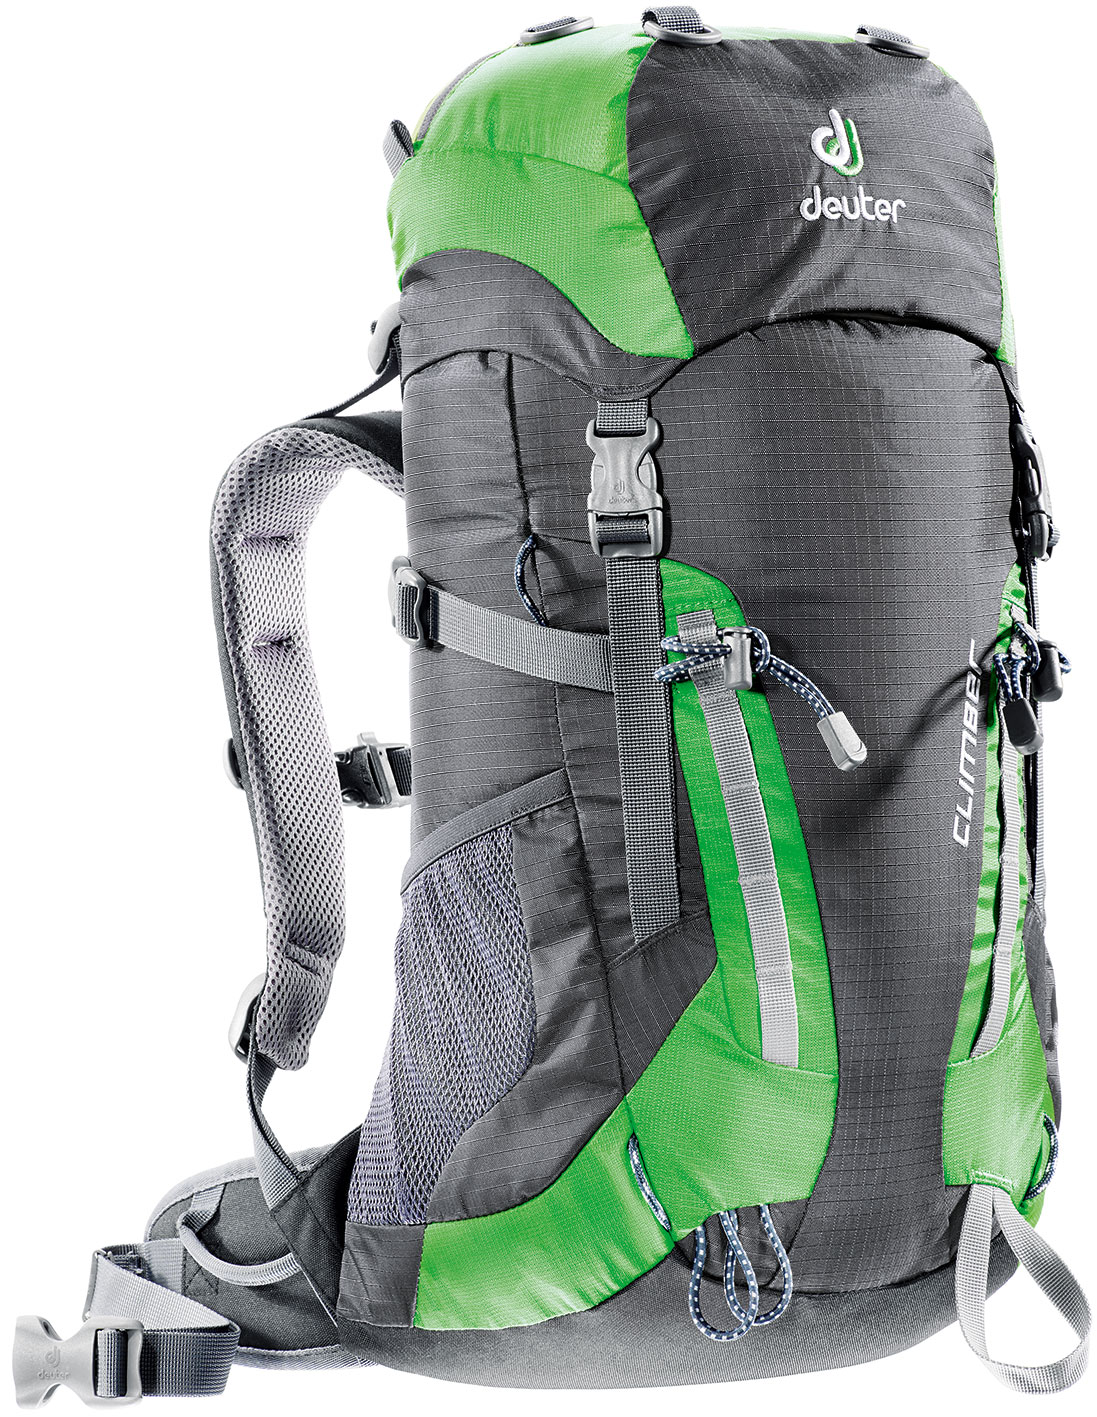 Deuter Climber anthracite-spring-30